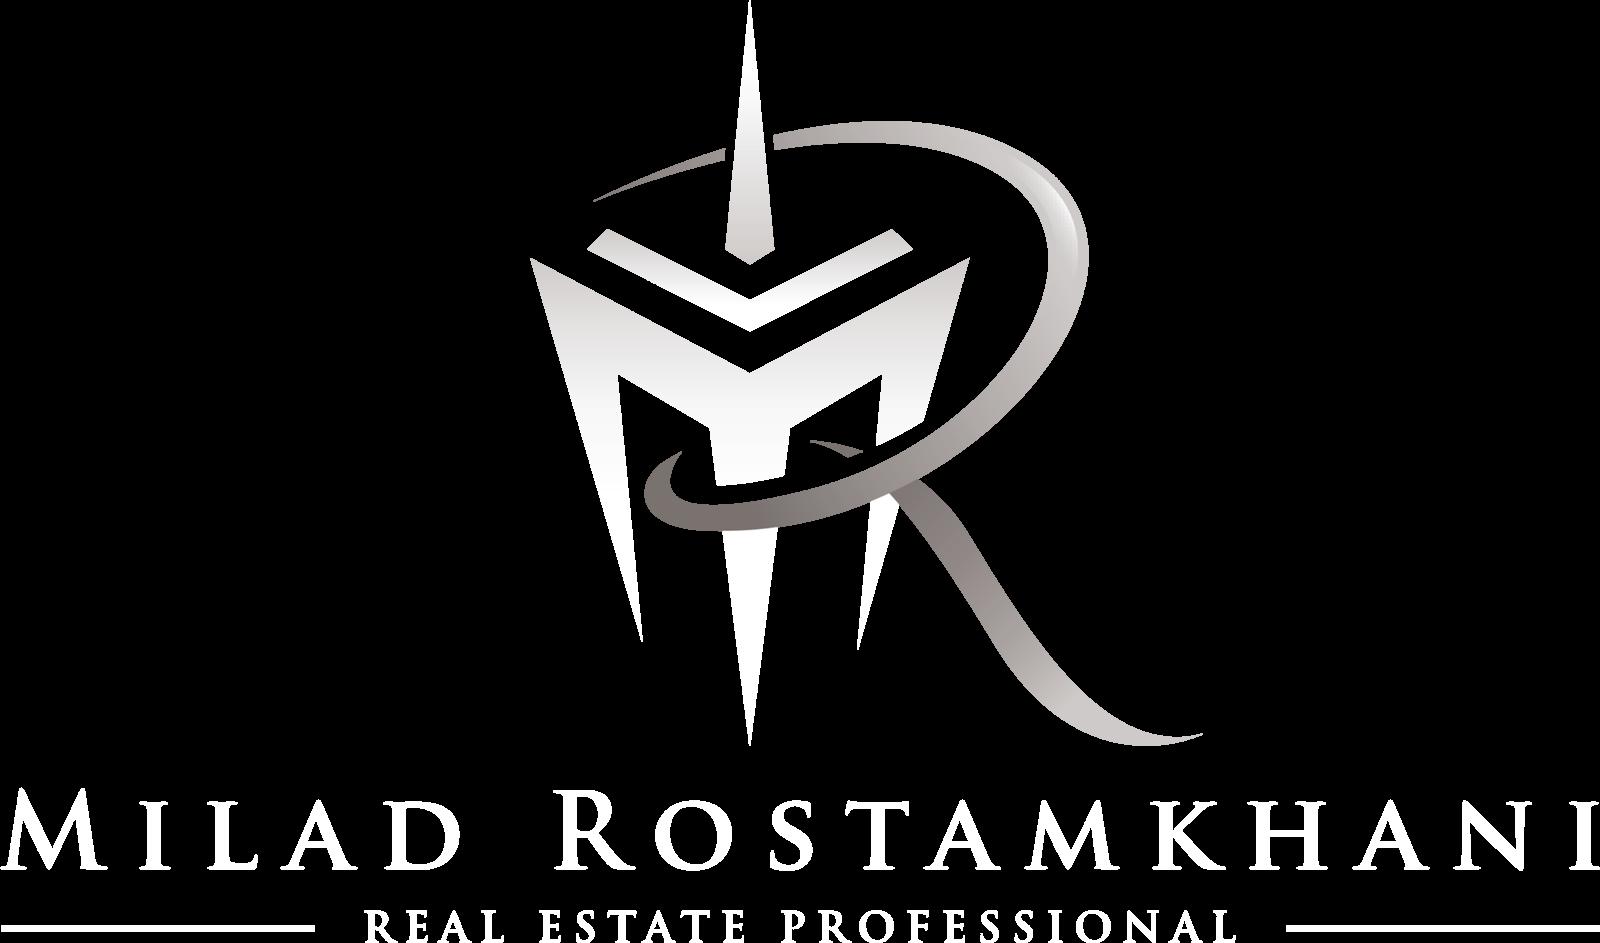 Milad Rostamkhani